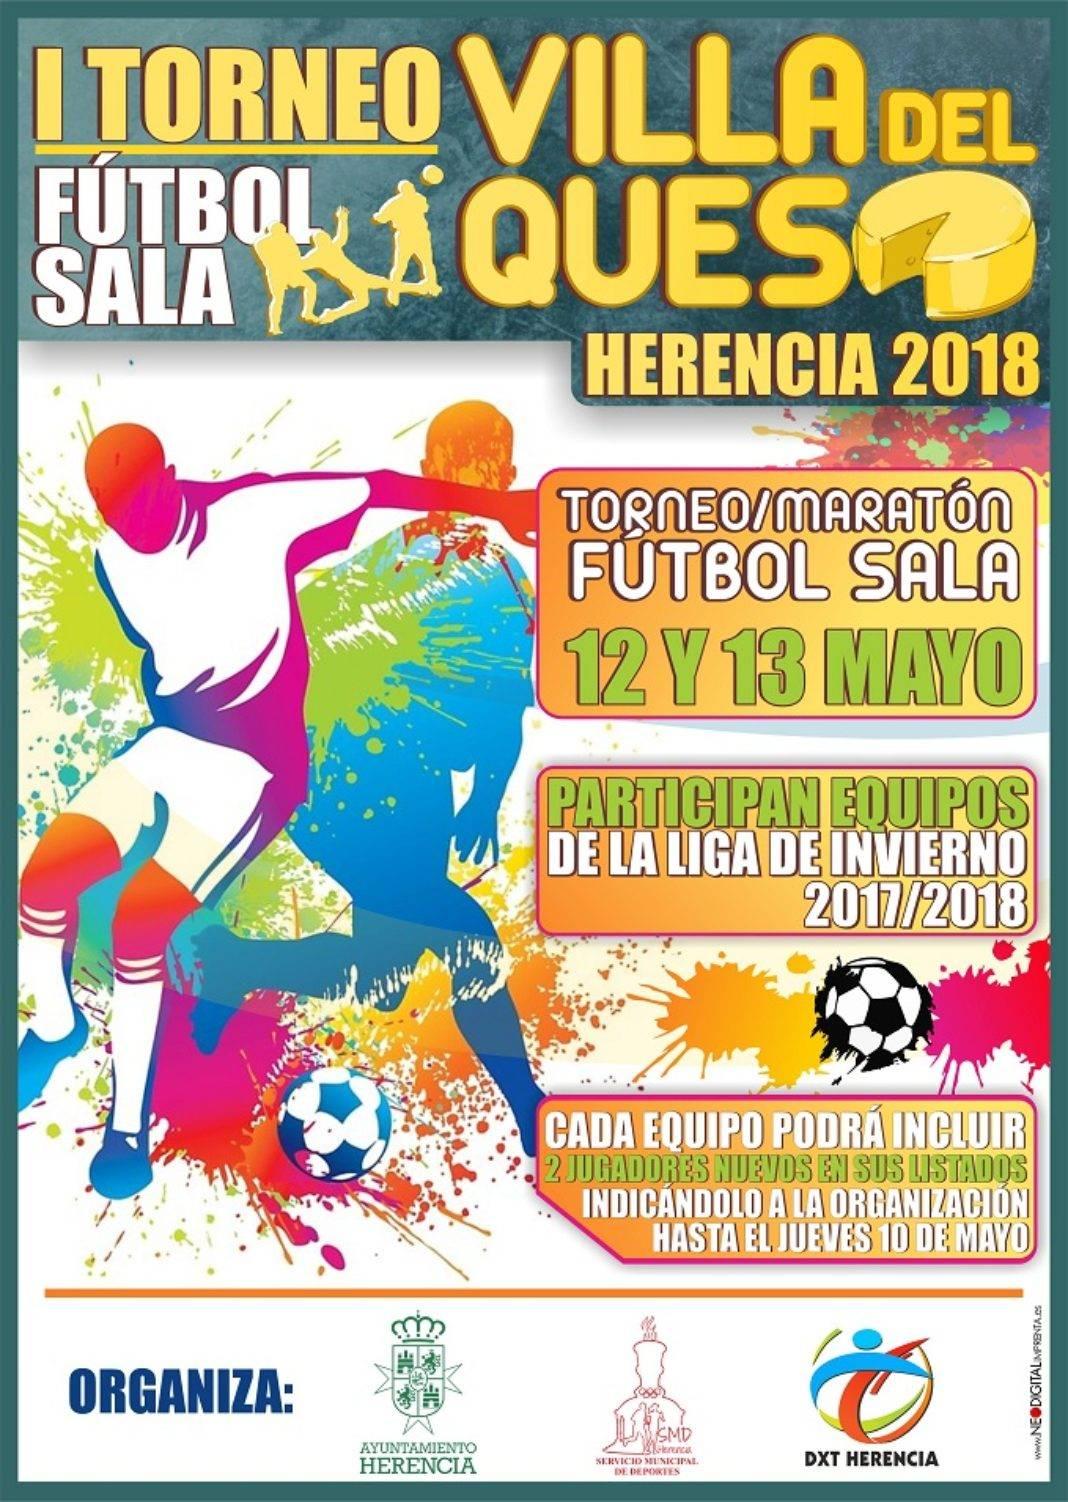 "I Torneo de Fútbol Sala ""Villa del Queso"" 4"